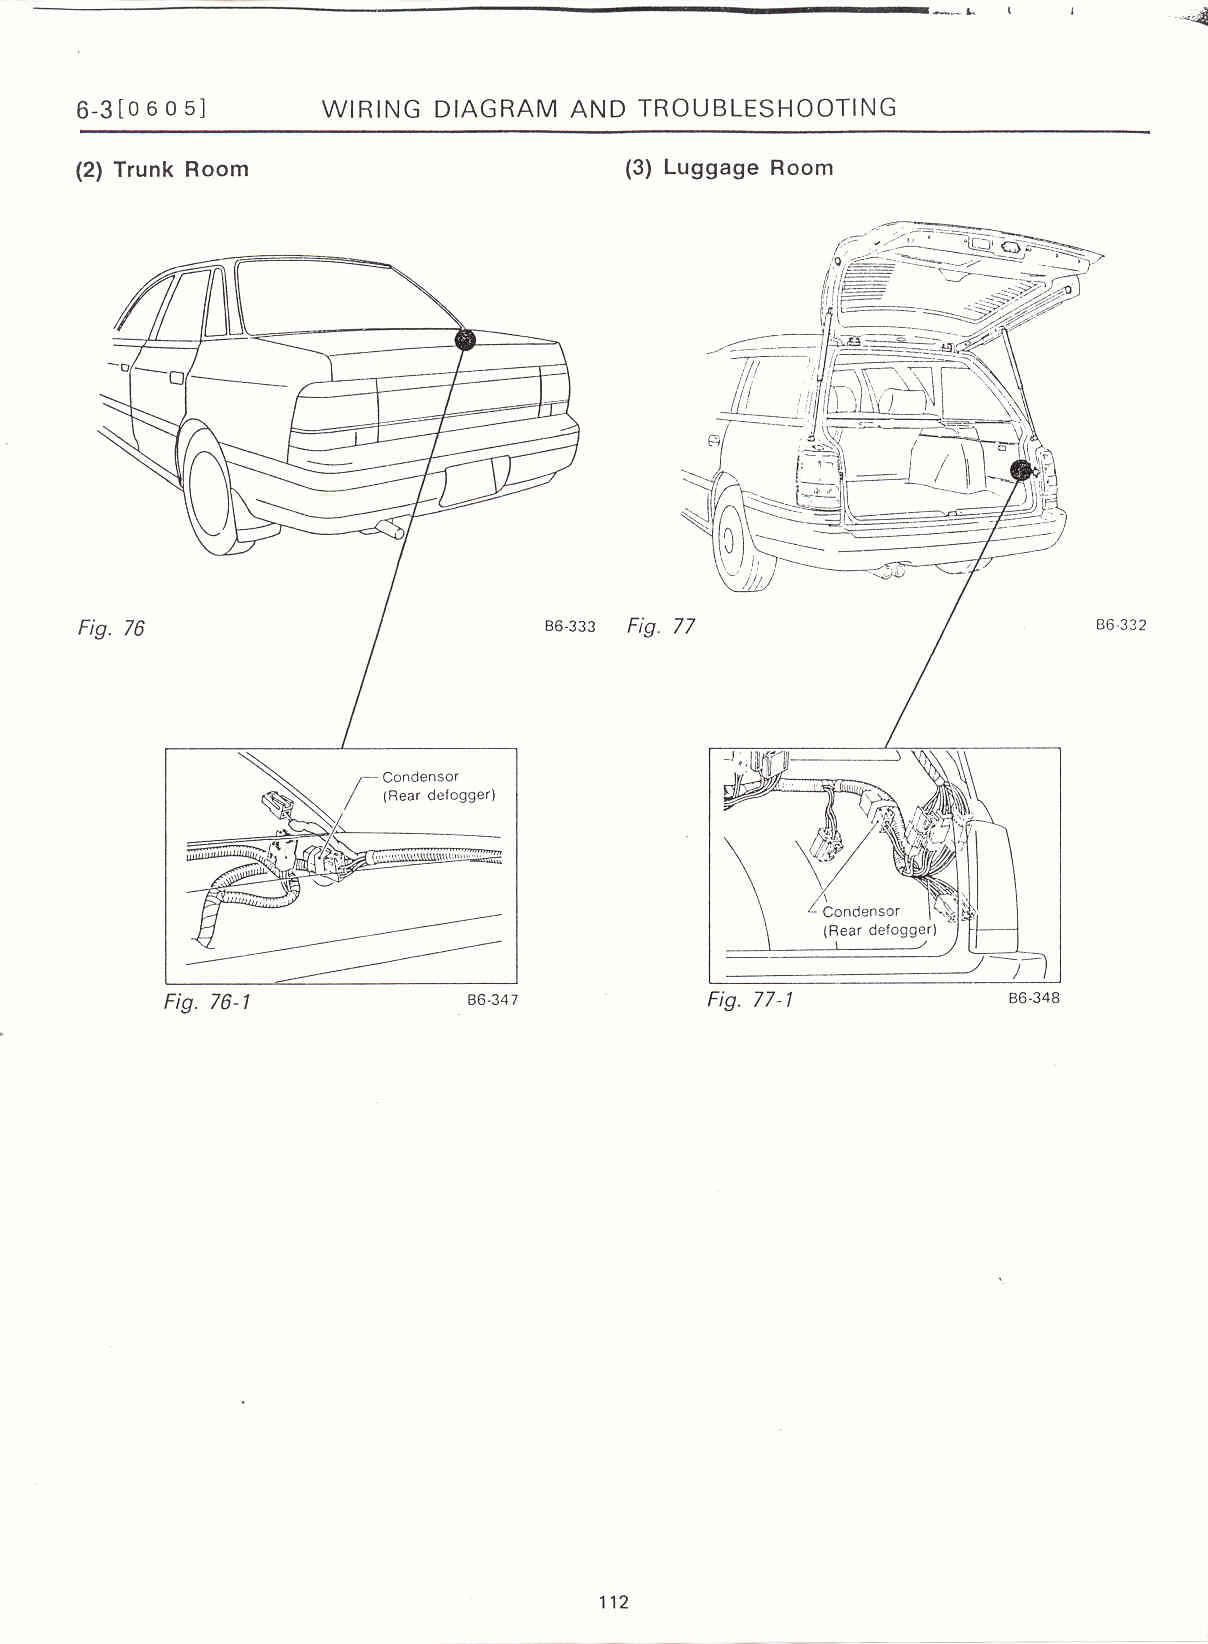 94 Mitsubishi Mirage Fuse Box Wiring Diagram Will Be A Thing 1995 Subaru Legacy Transmission Solenoid Imageresizertool Com 1994